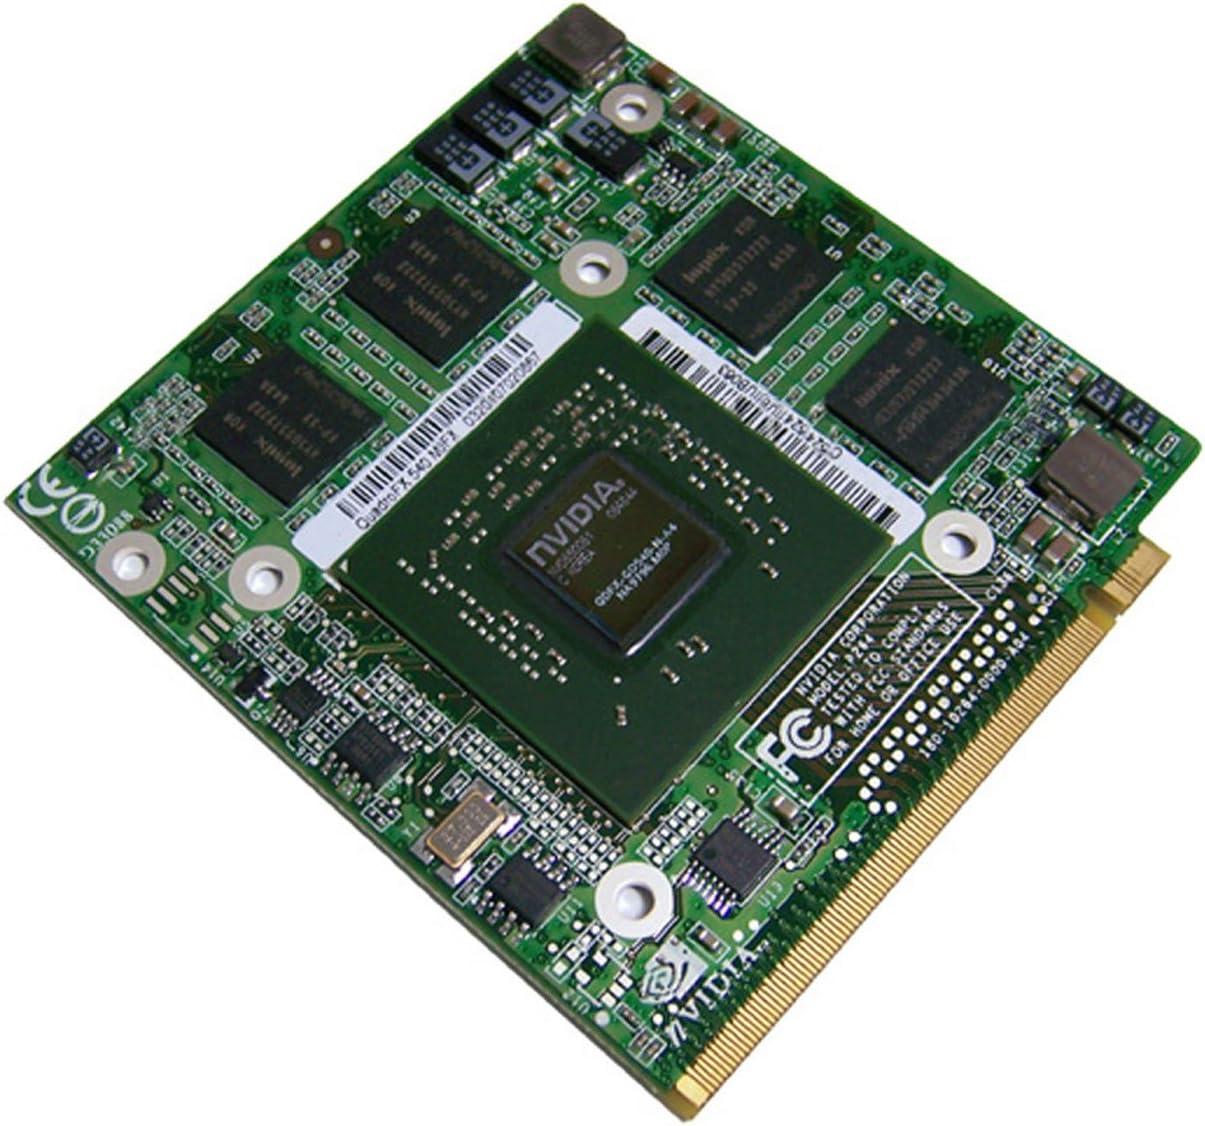 128MB HP FX540 Go MXM-II ProLiant xw25p Blade Video Card 390151-001